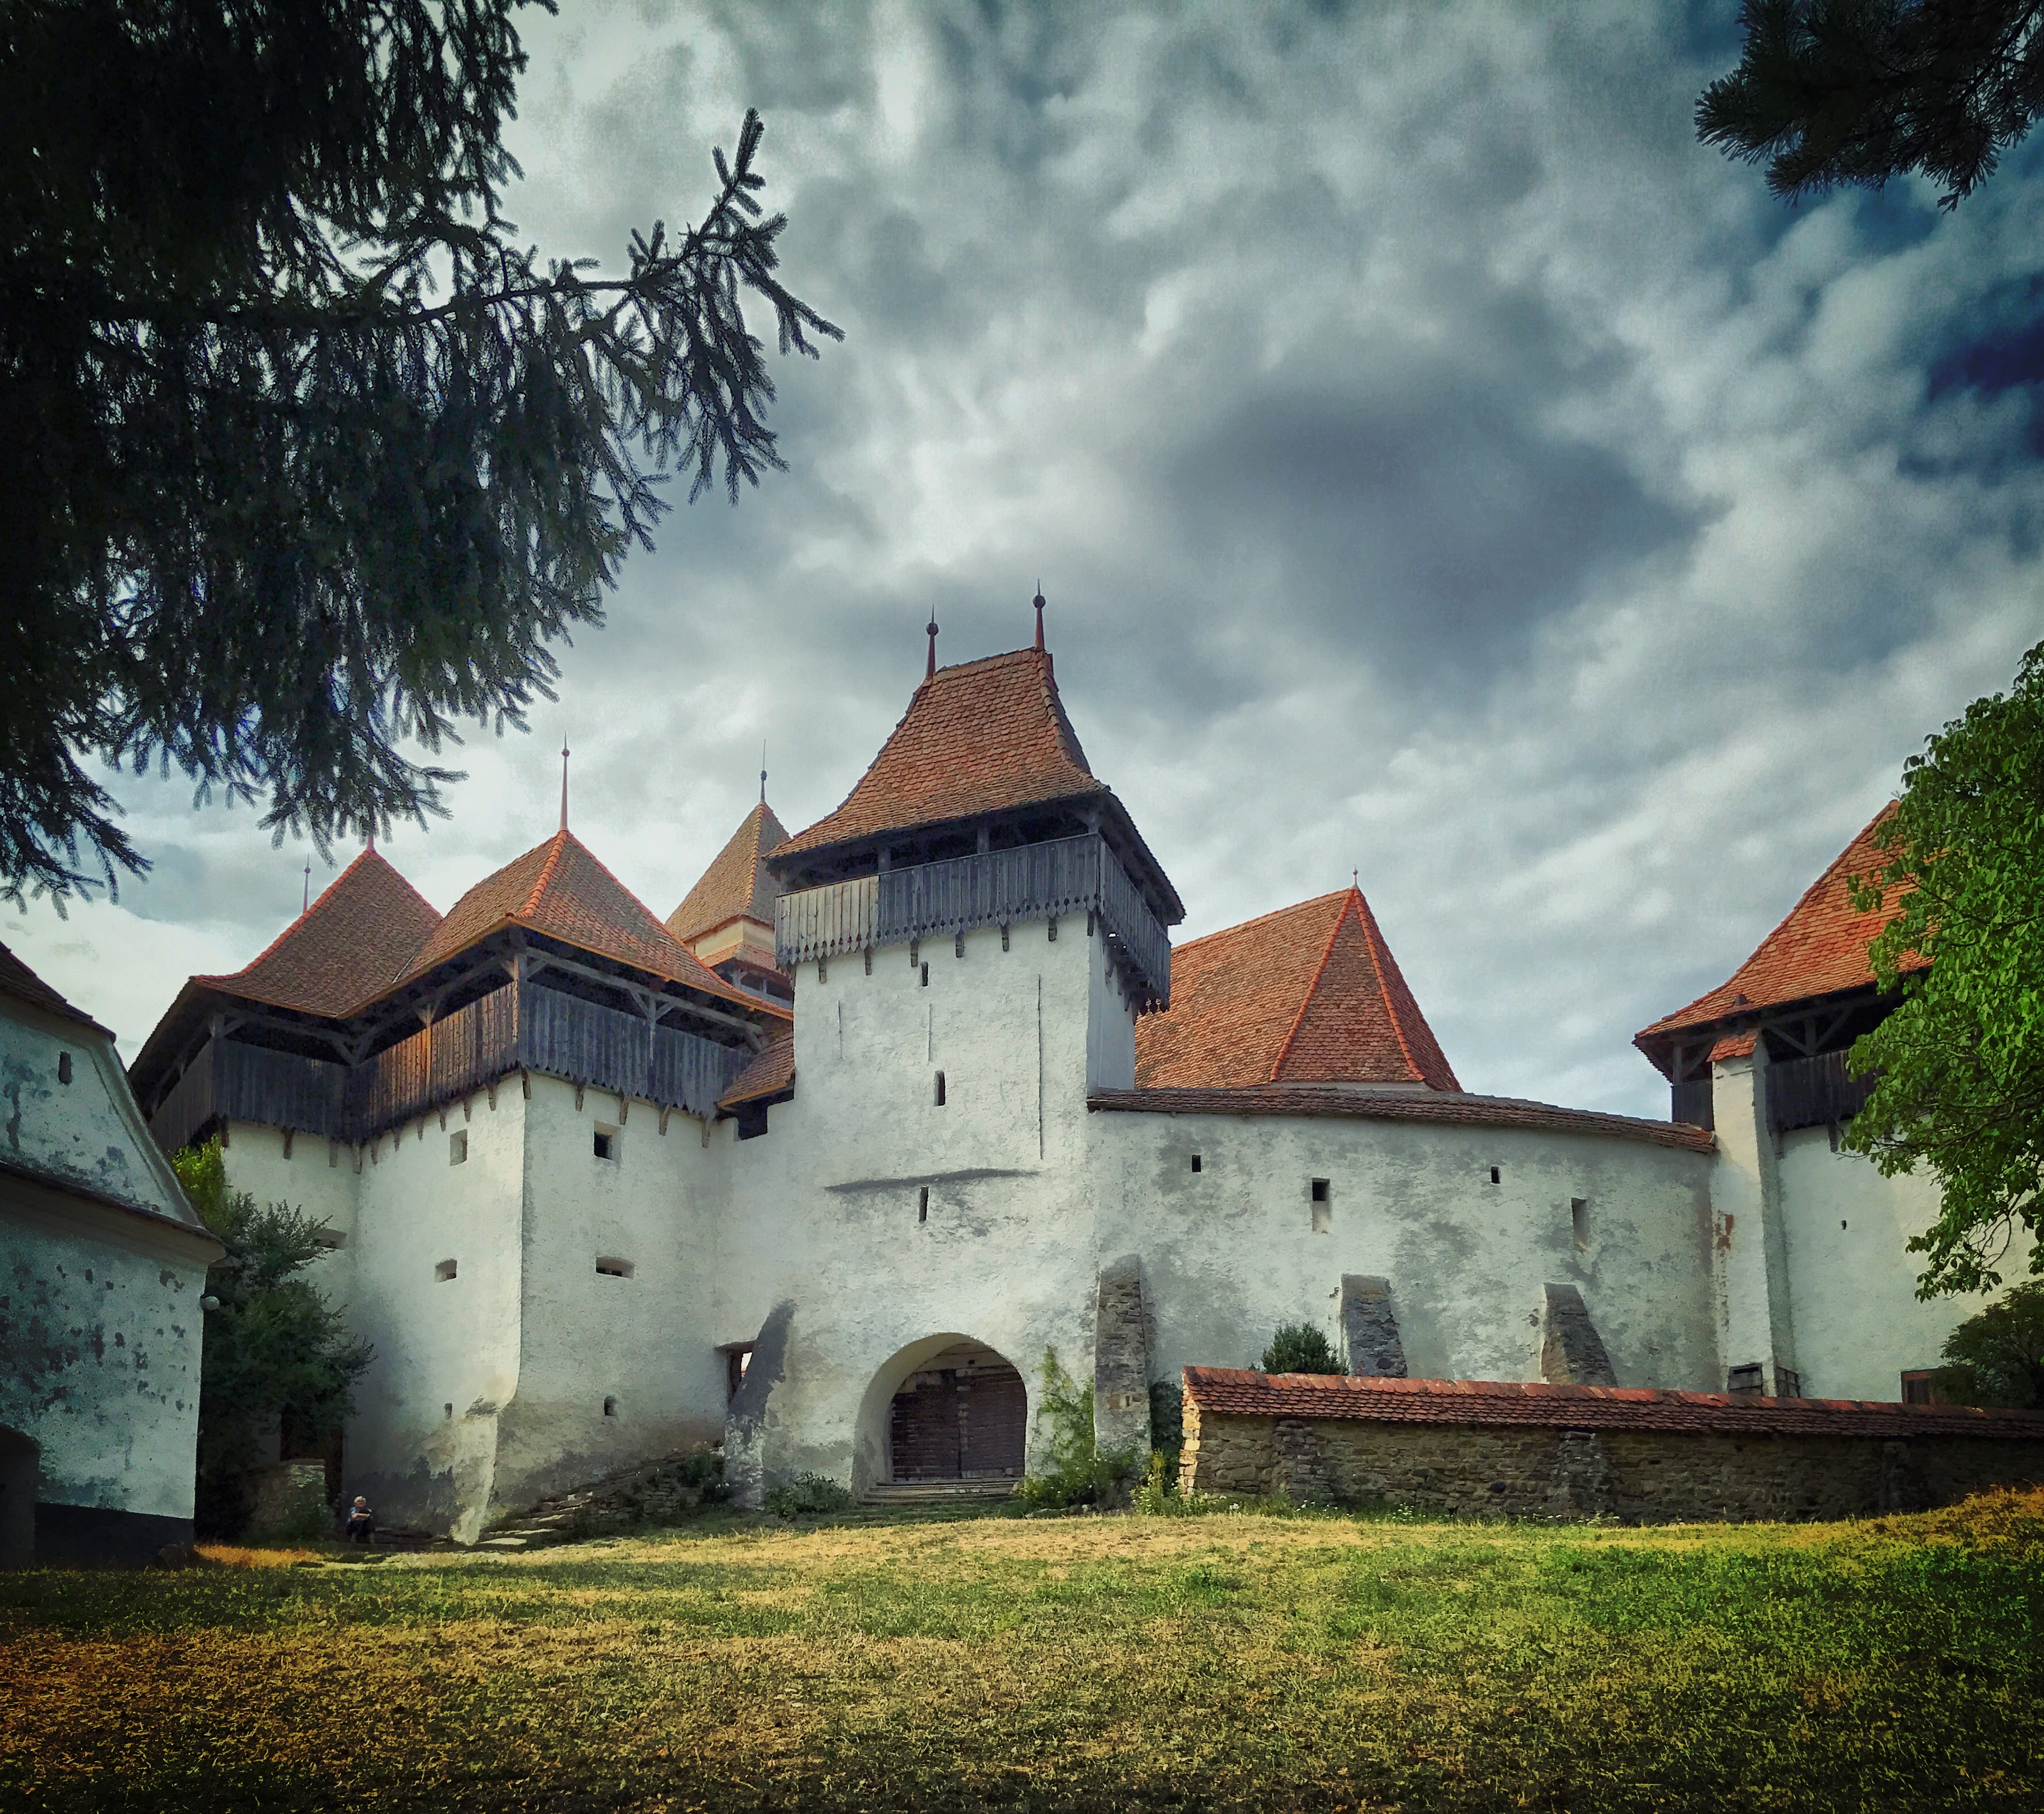 Die berühmte Kirchenburg in Viscri